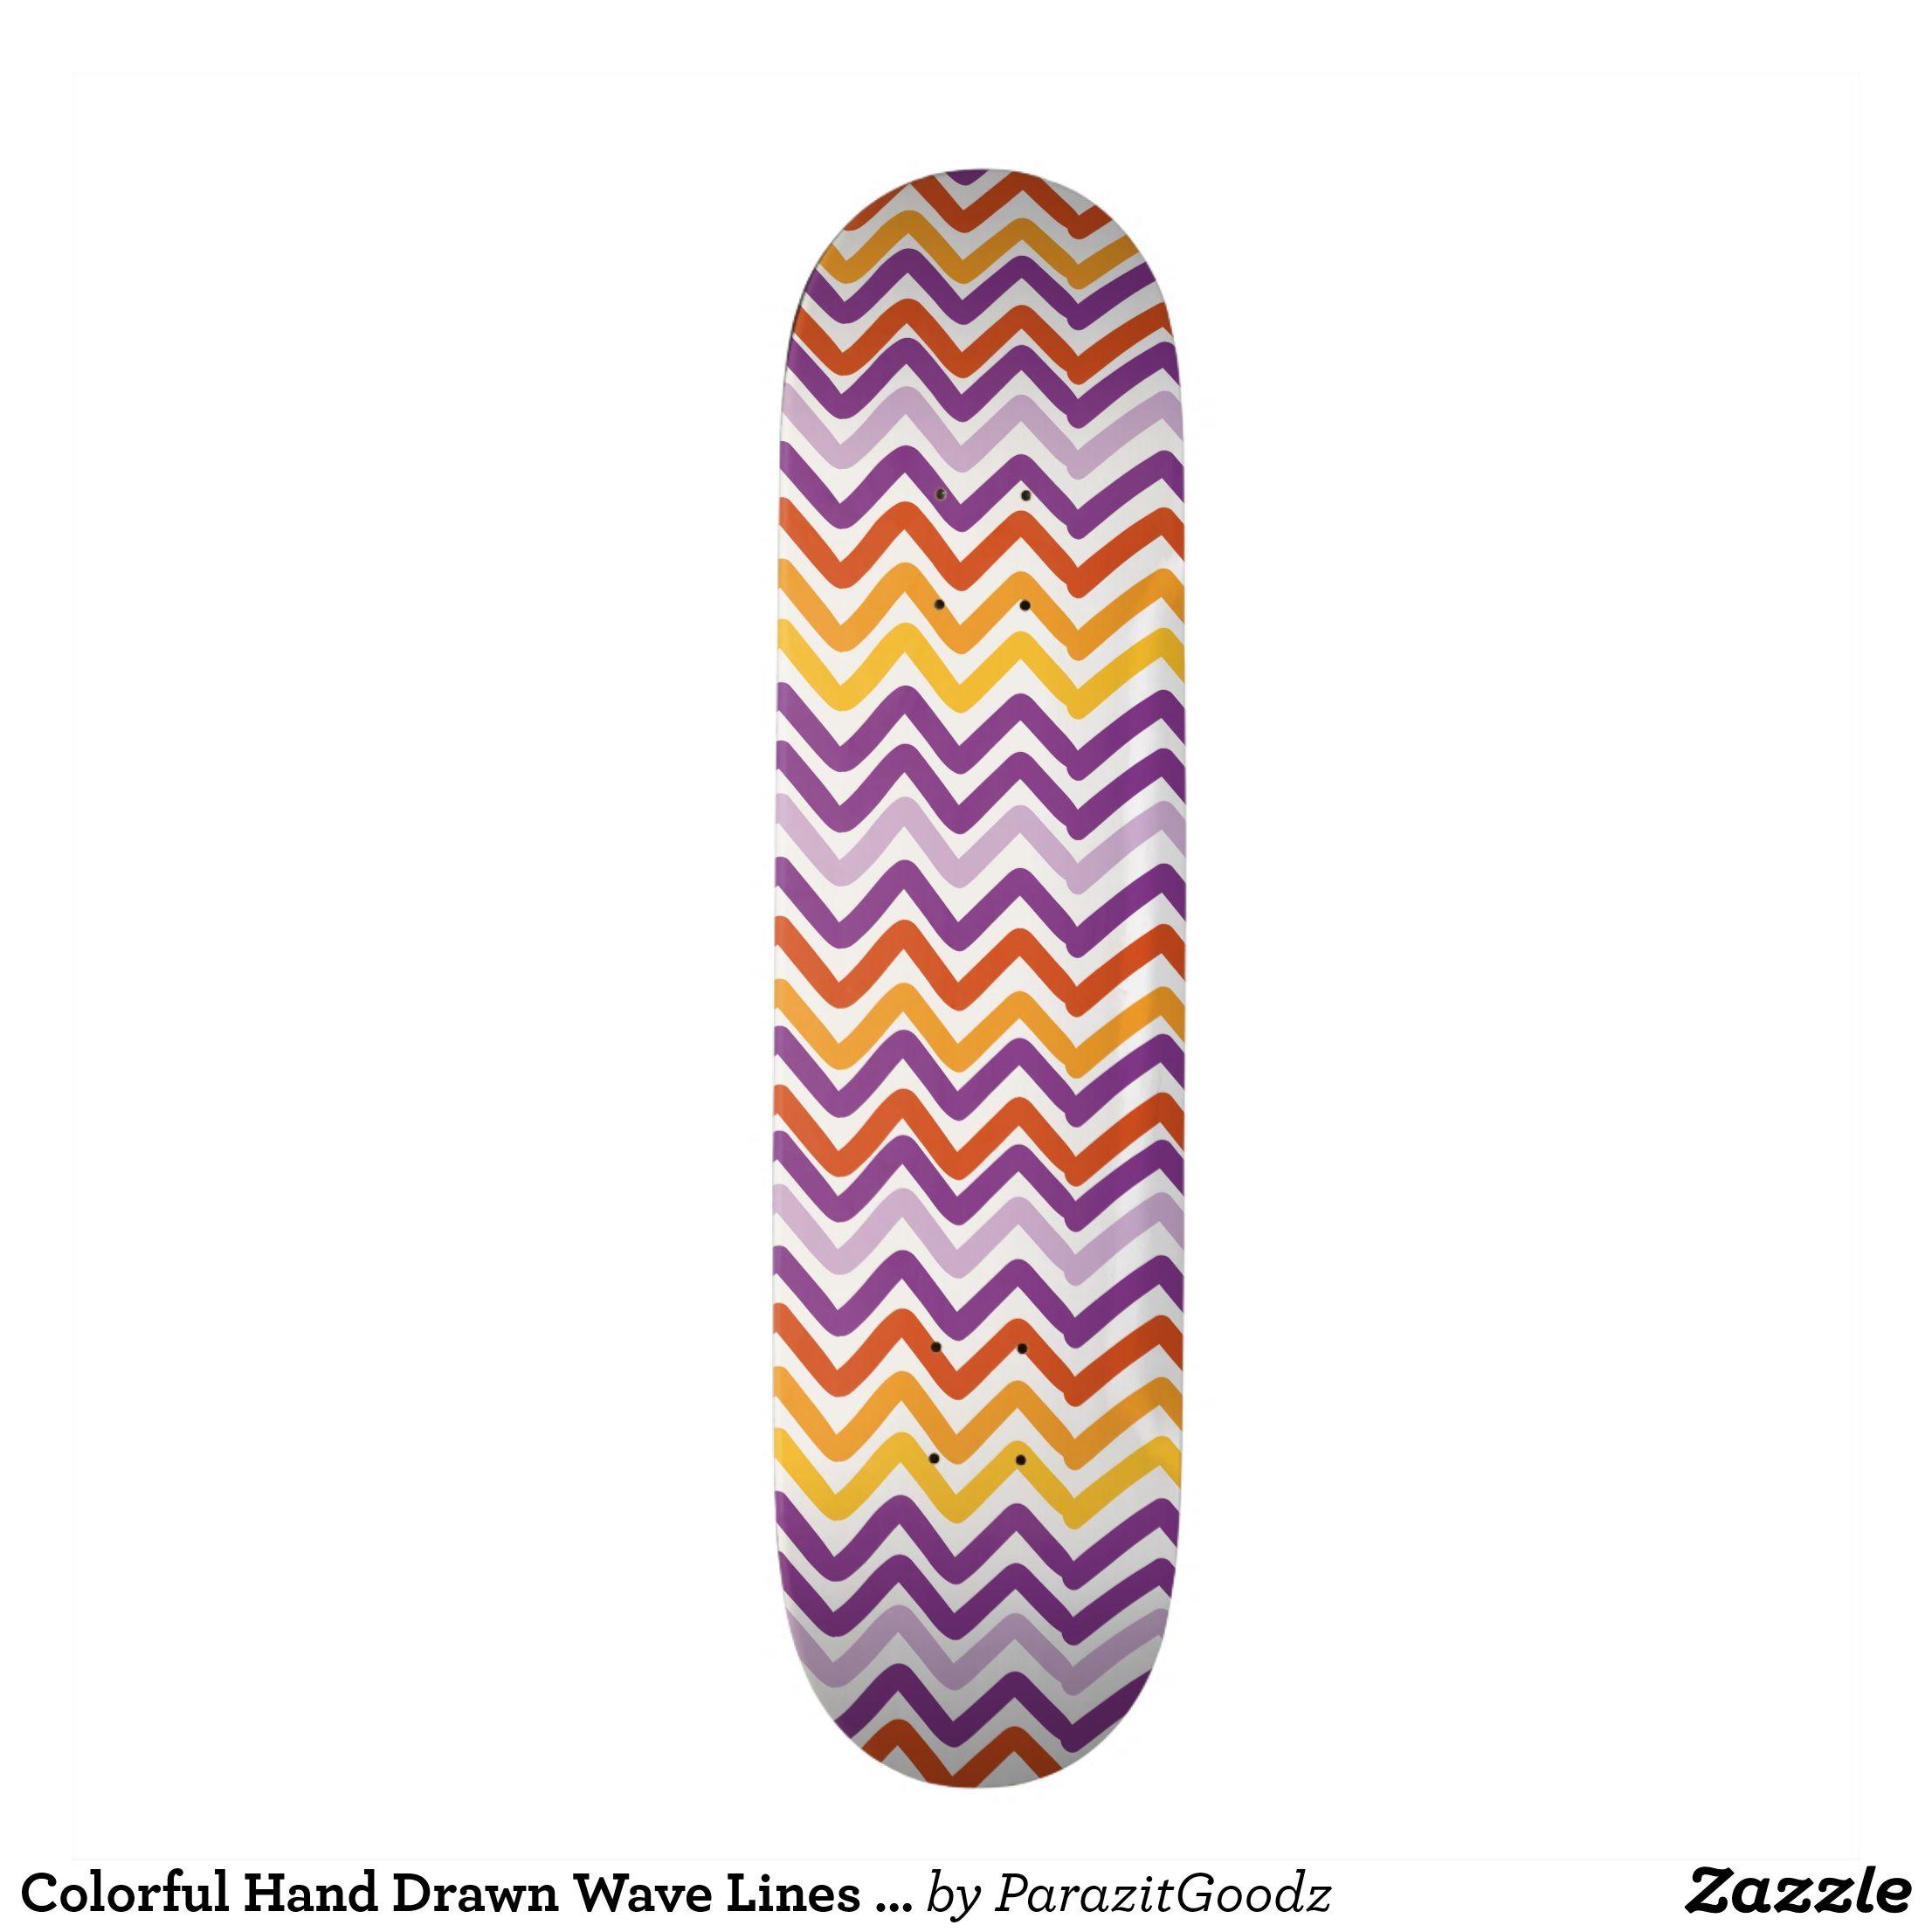 Colorful Hand Drawn Wave Lines Pattern Skateboard Supreme Hard